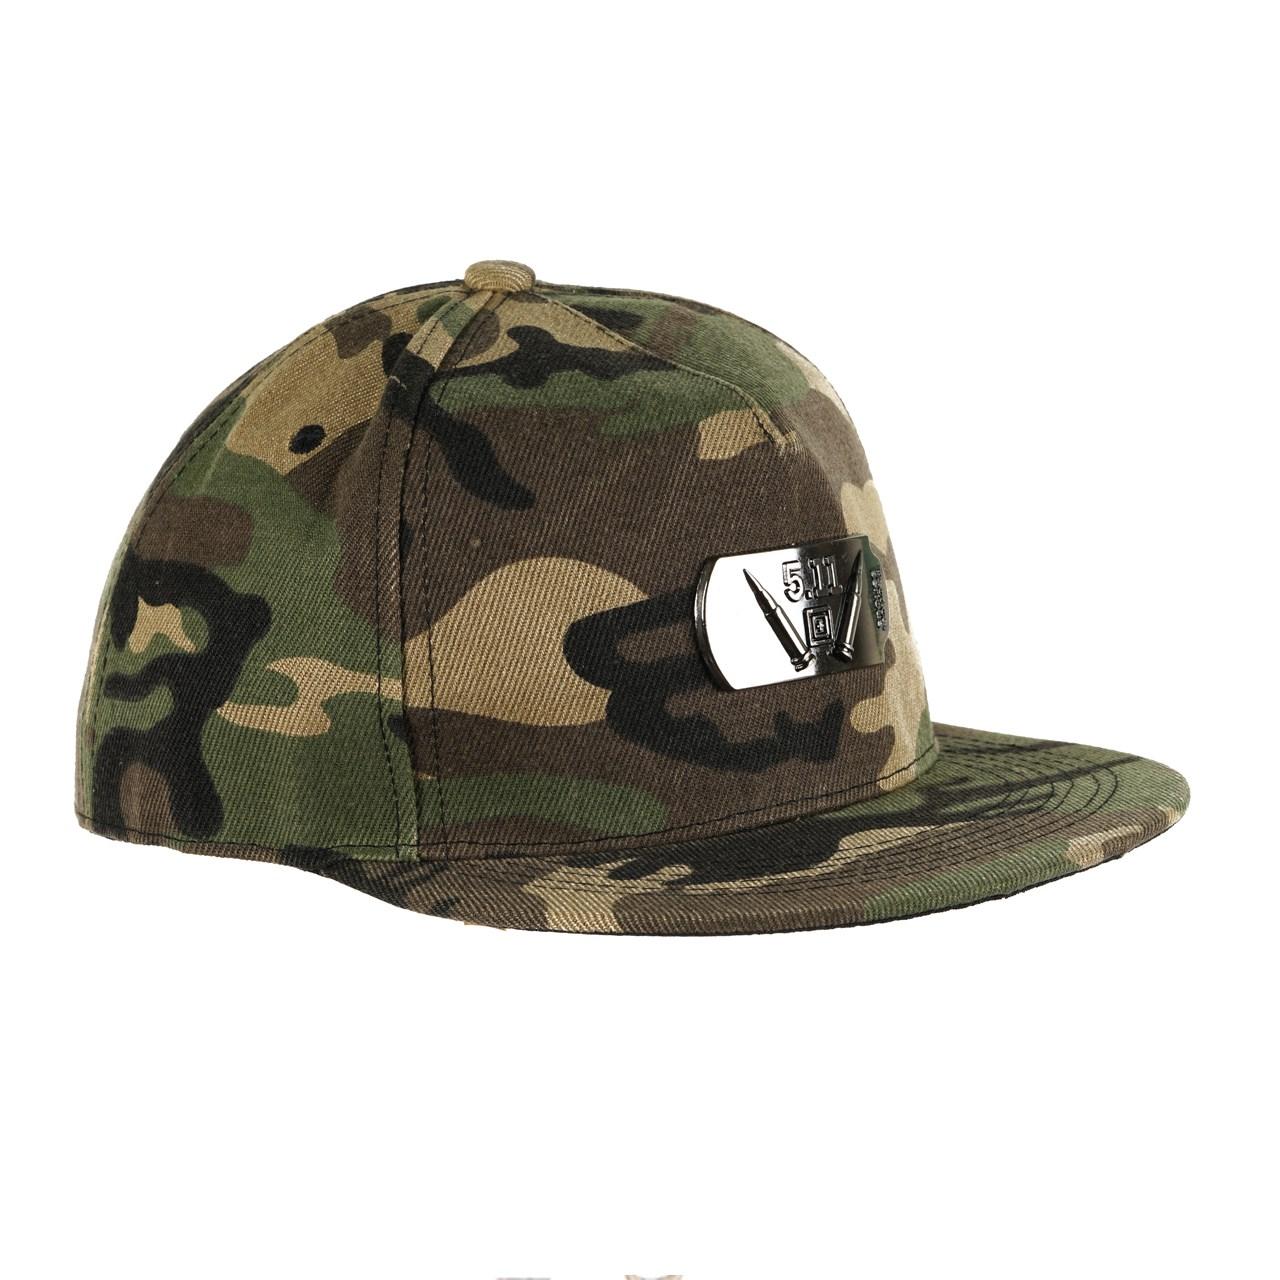 کلاه آفتابی مدل Force 511